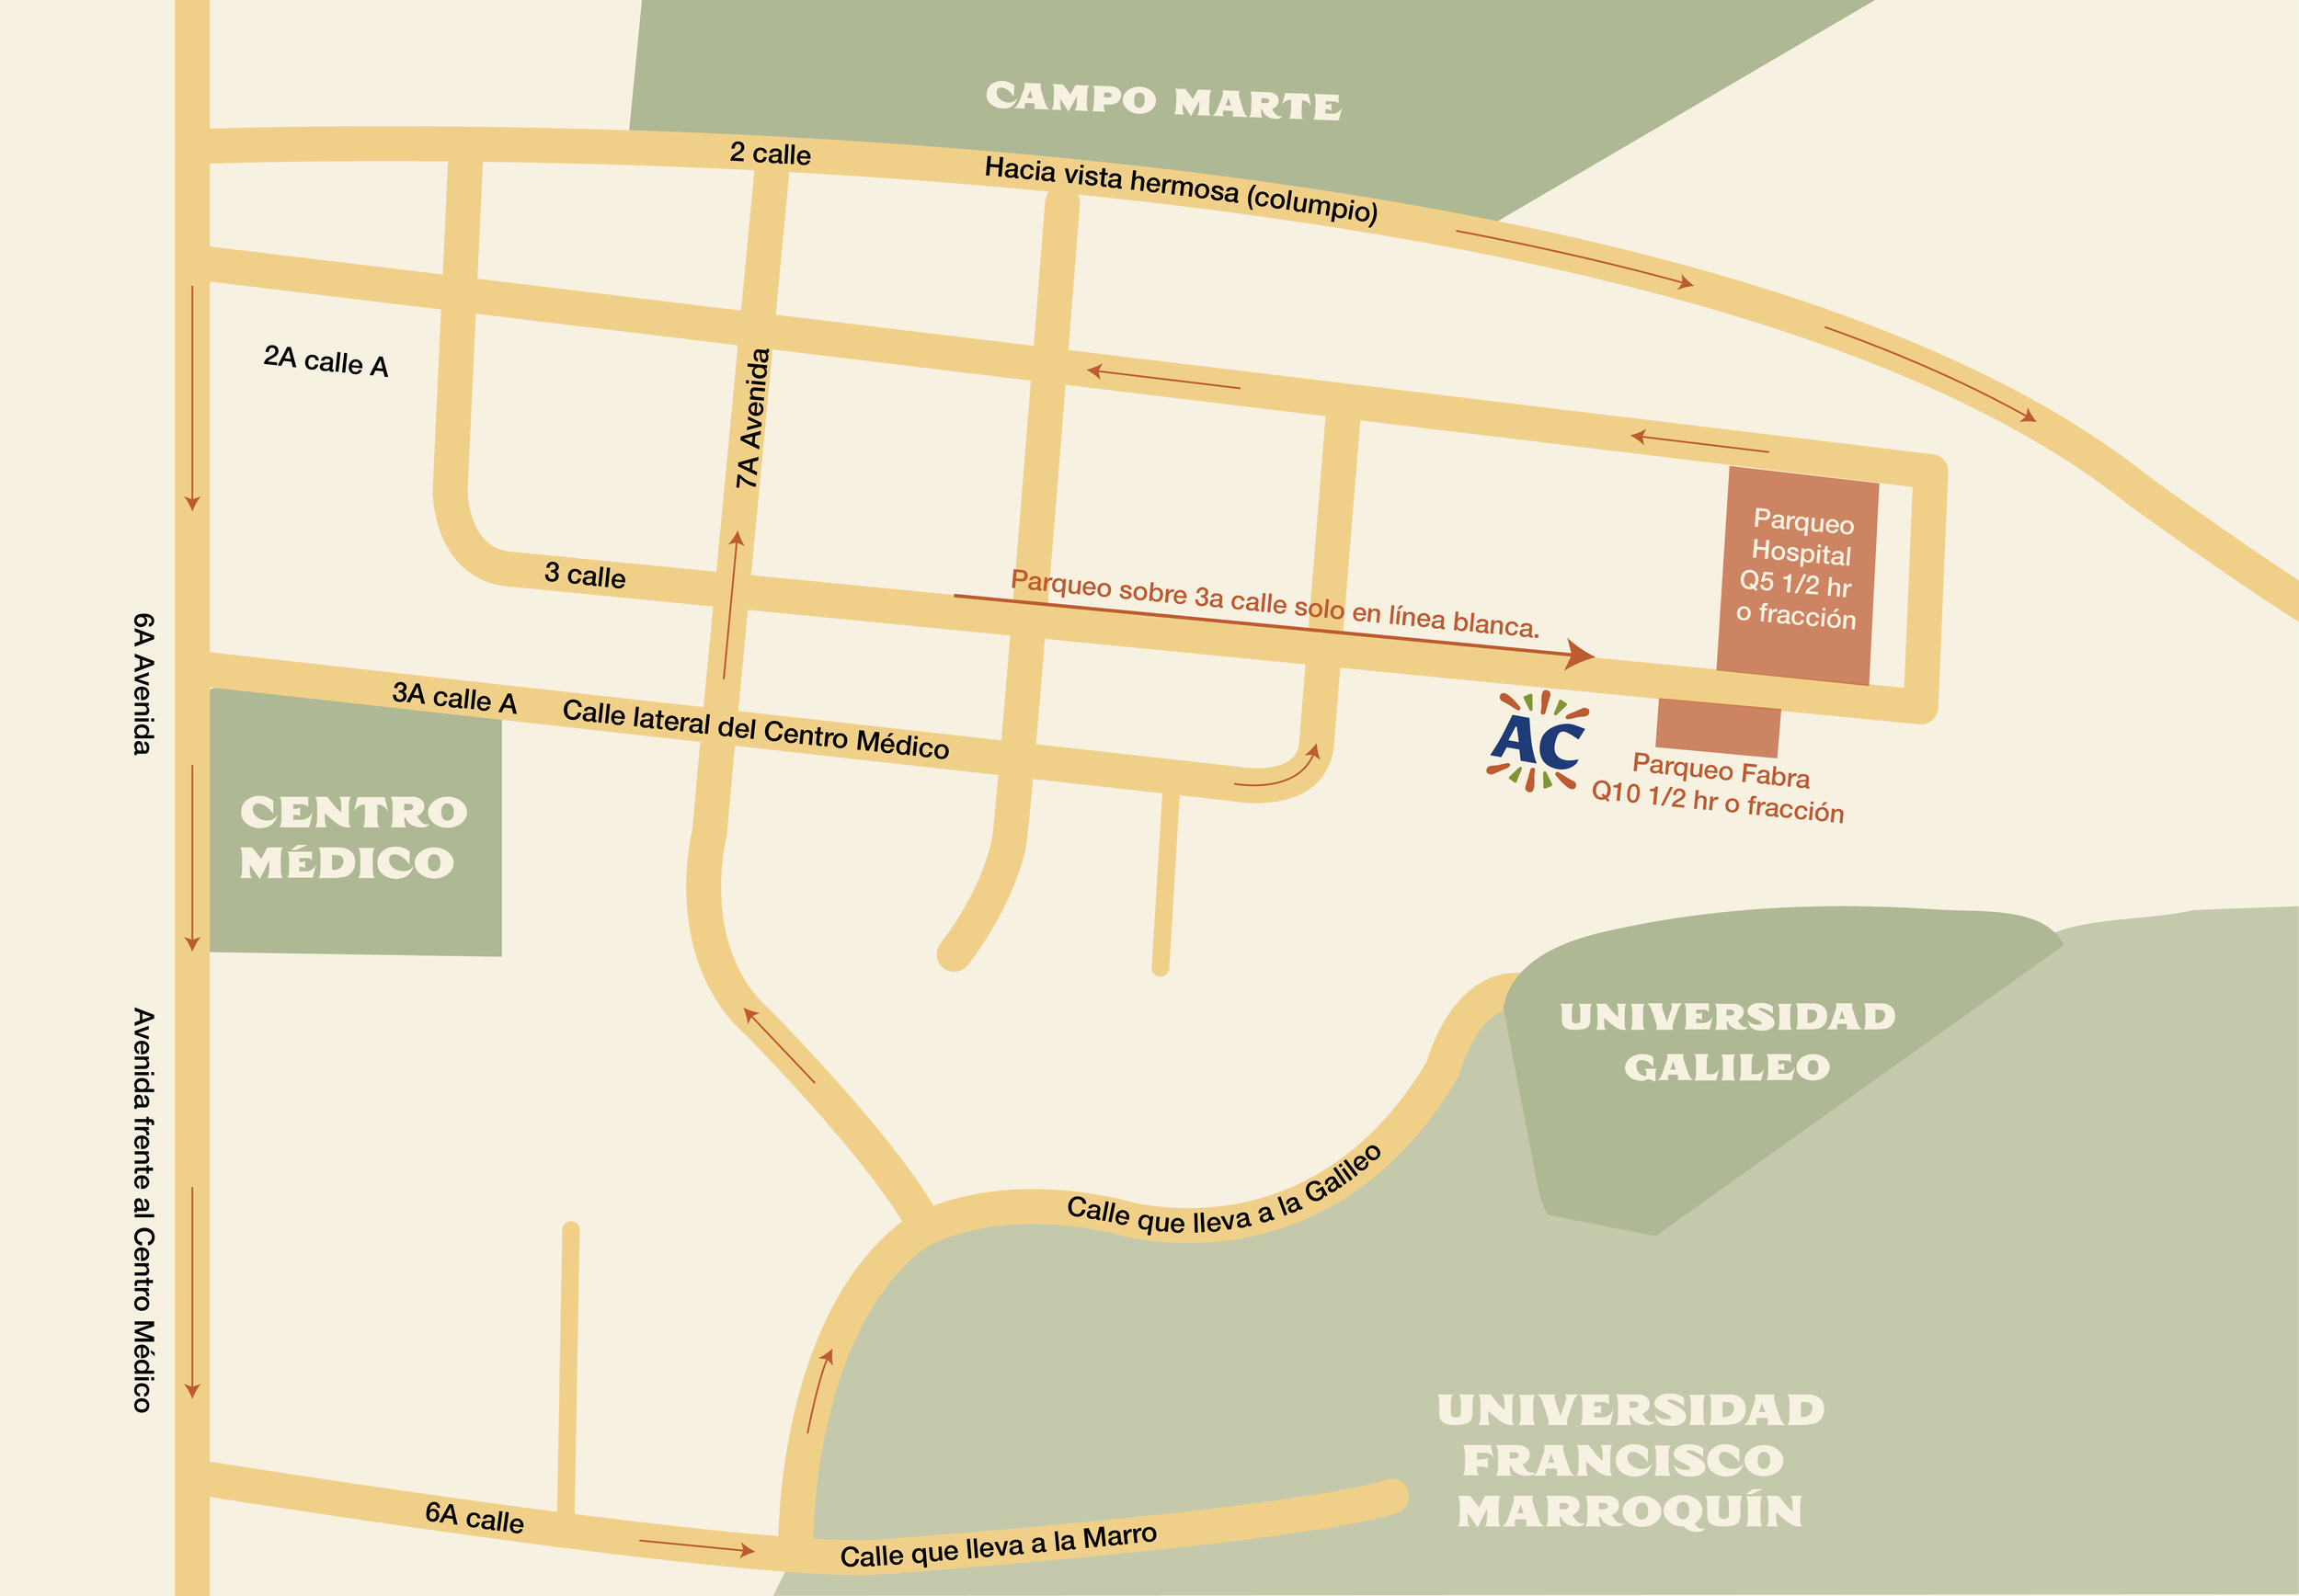 Mapa-AC detalle-02.png